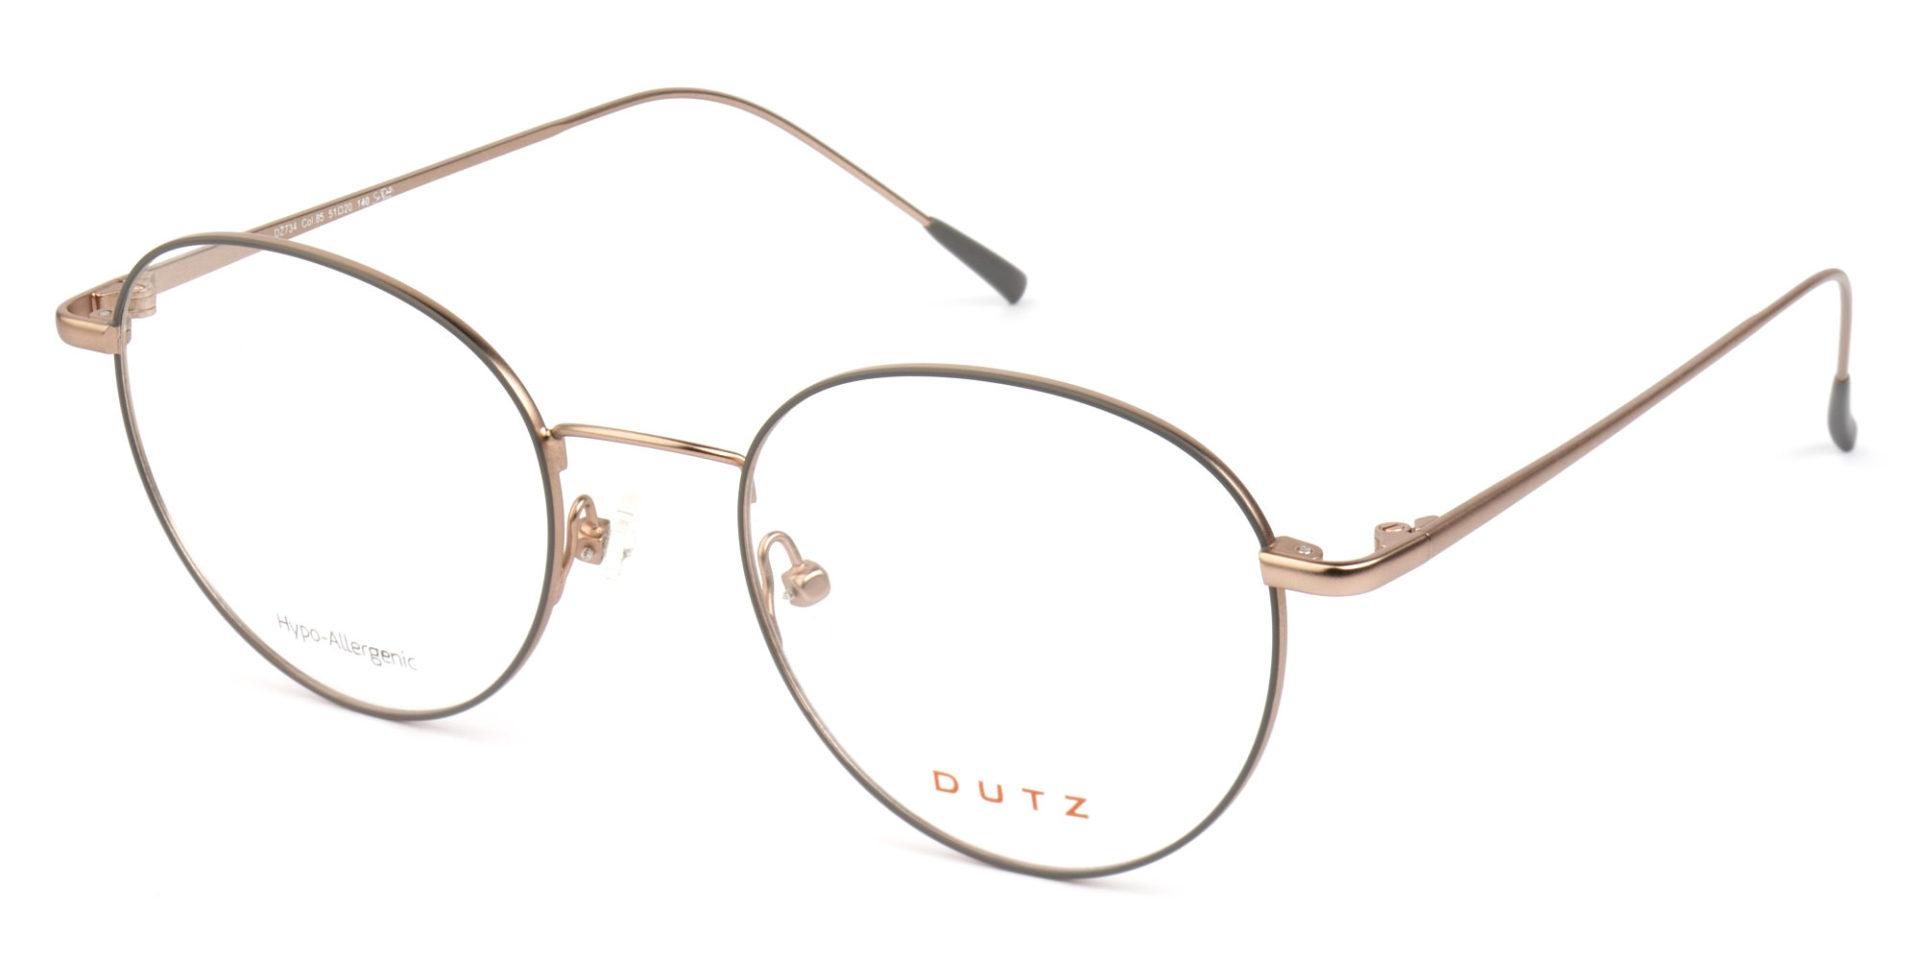 DZ734-85